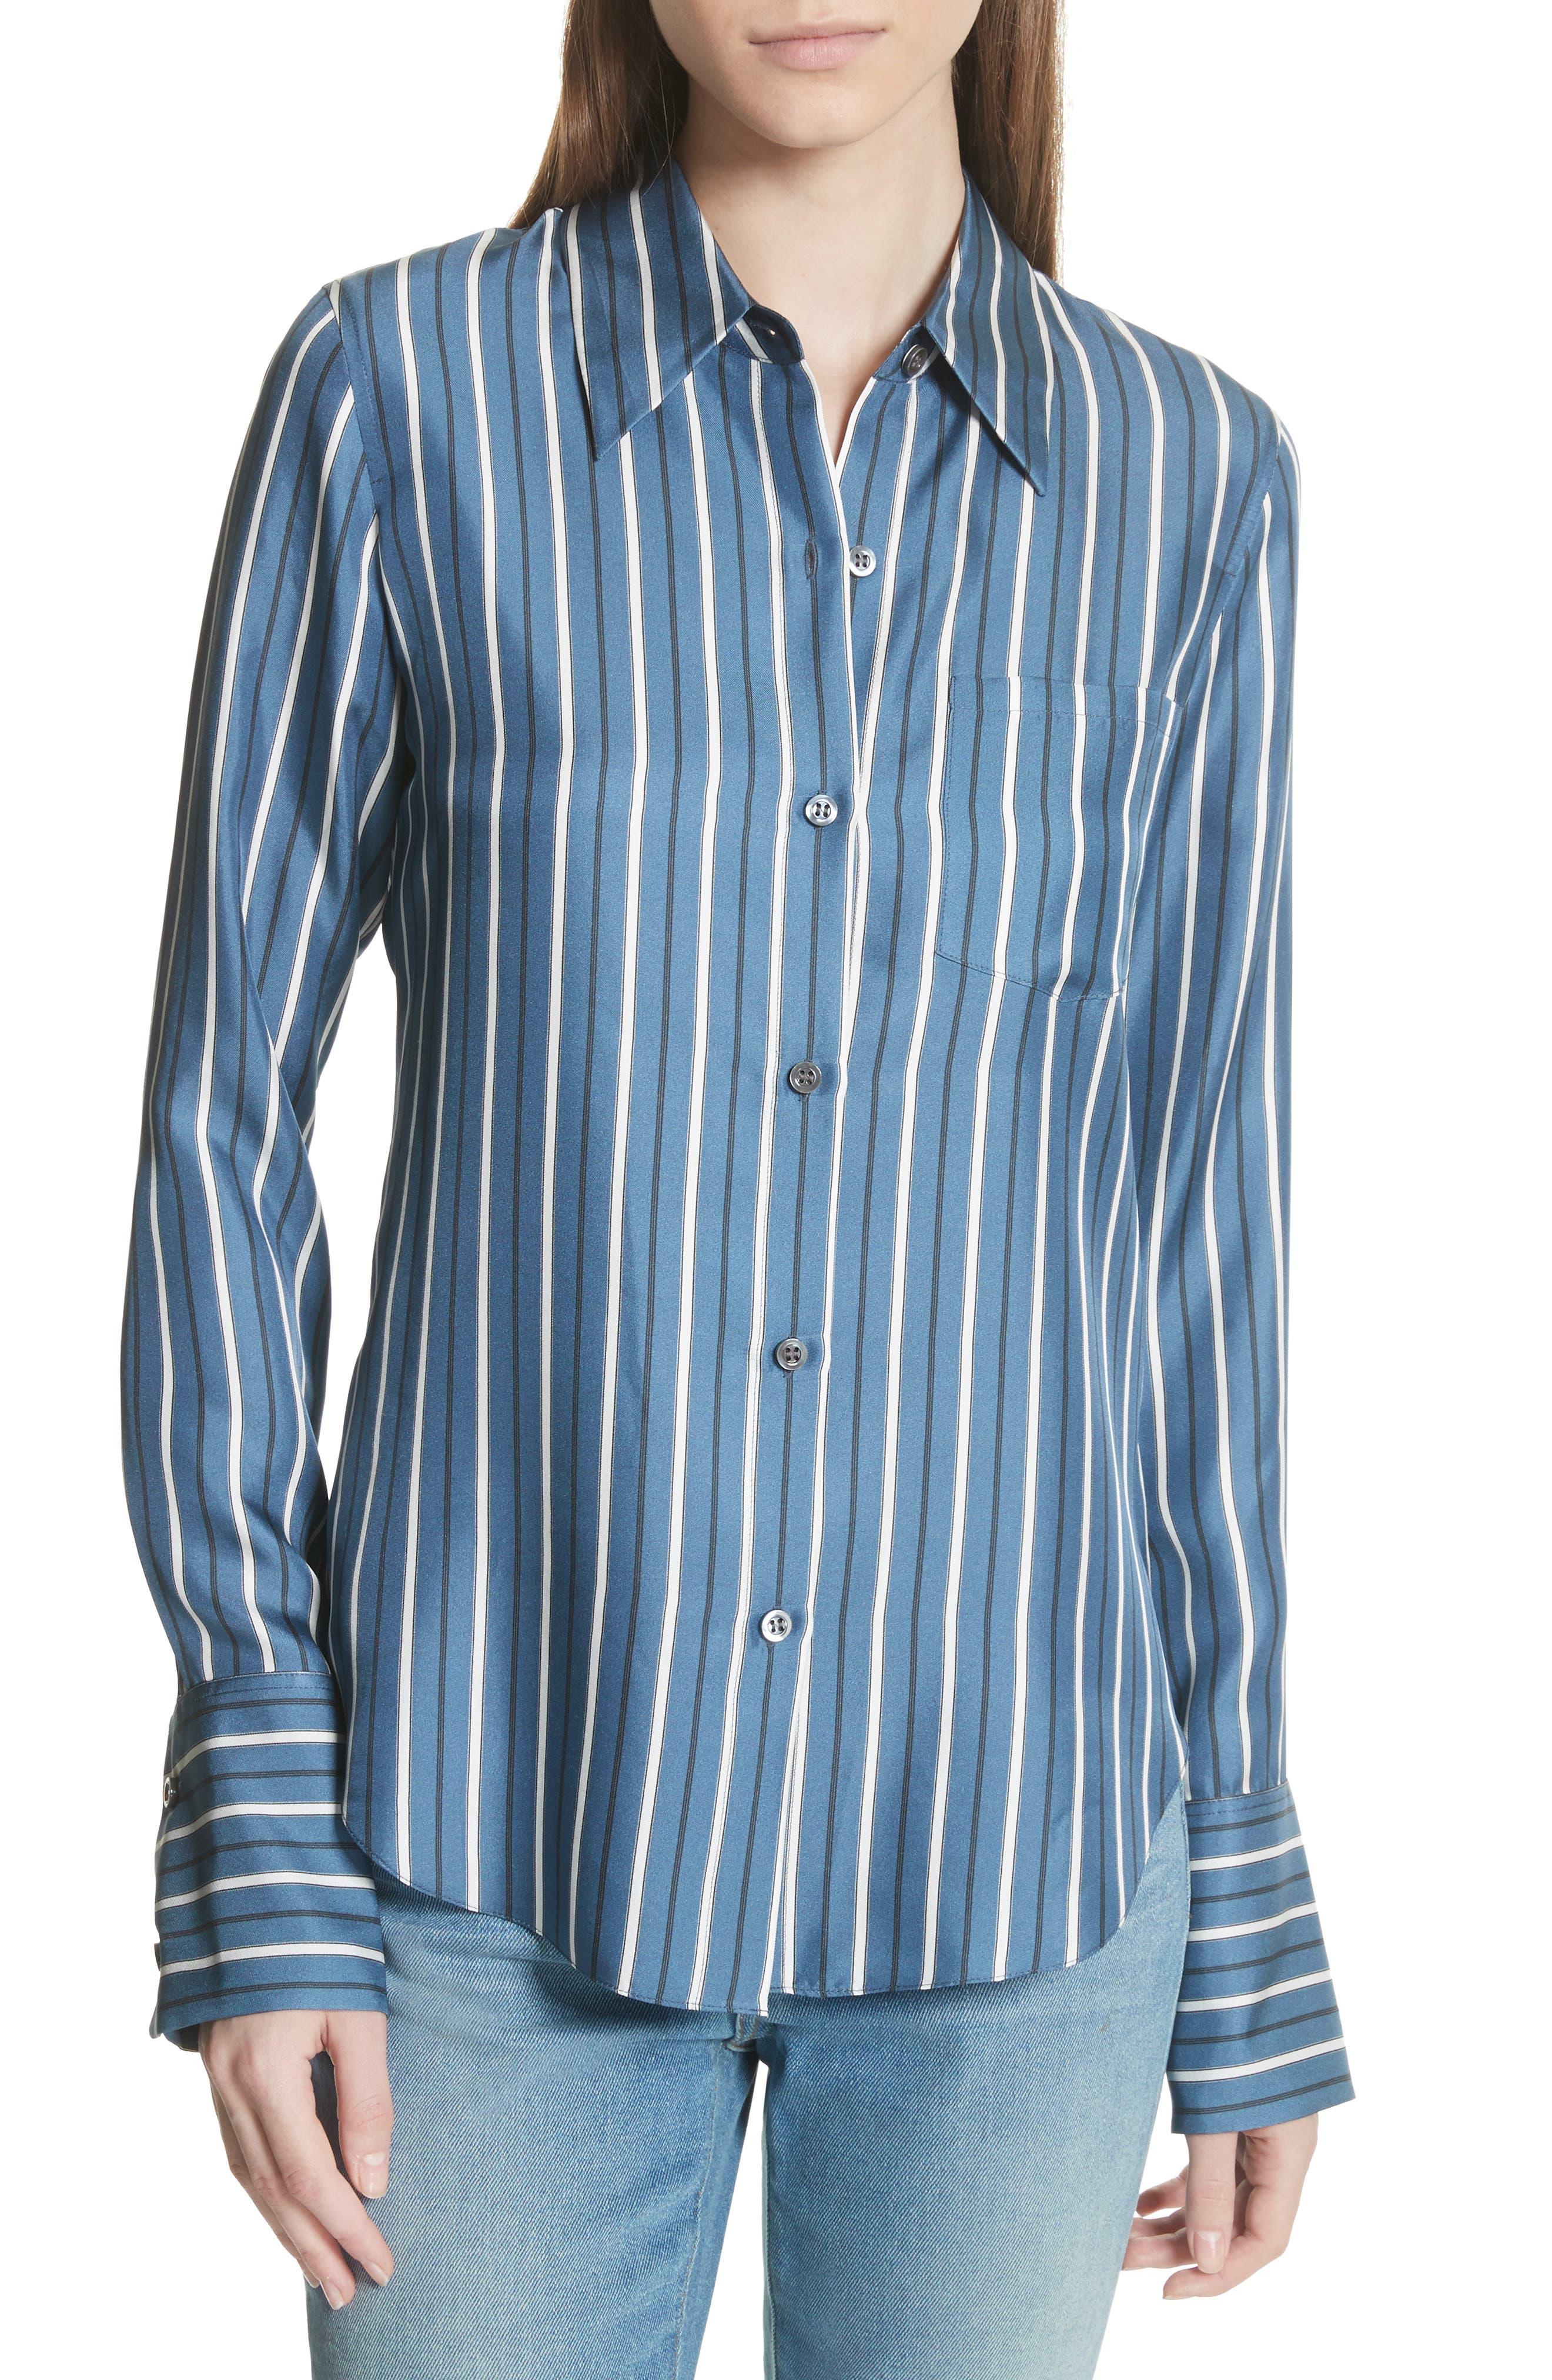 Darby Silk Button Shirt,                         Main,                         color, Light Santorini Blue